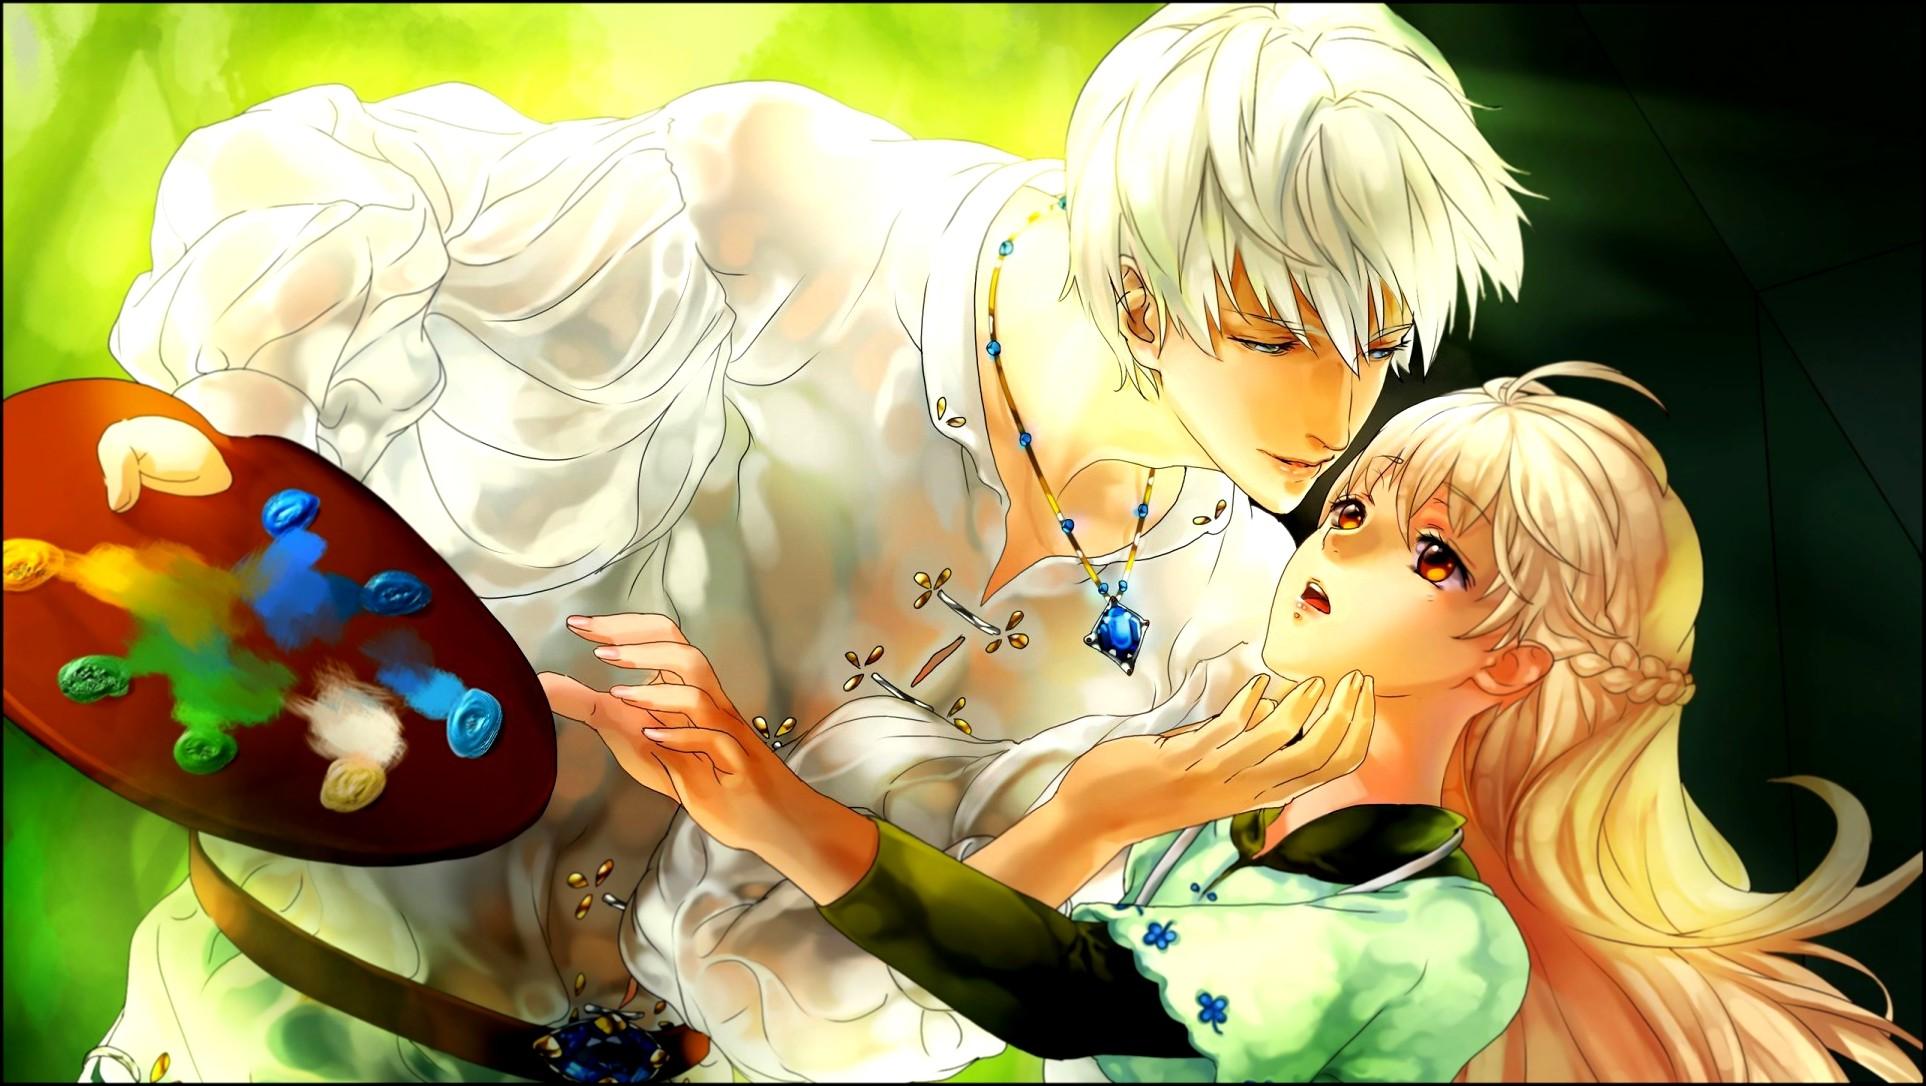 cute anime couple wallpaper. Download Wallpaper / Select Resolution ↓.  Original. 1926×1086